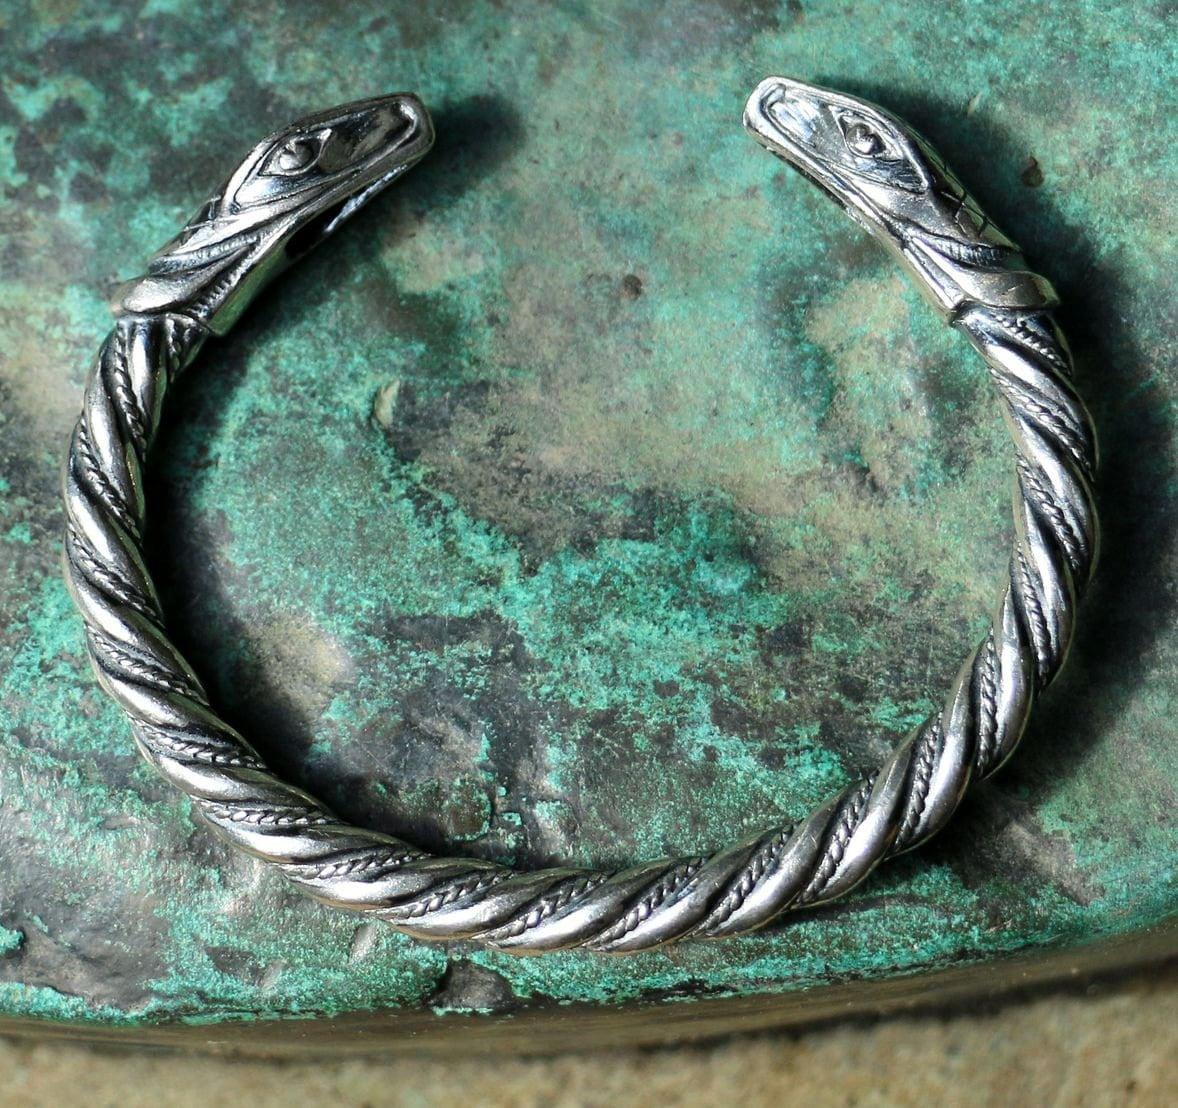 J 214 Rmungandr Midgard Serpent Silver Snake Bracelet Sterling